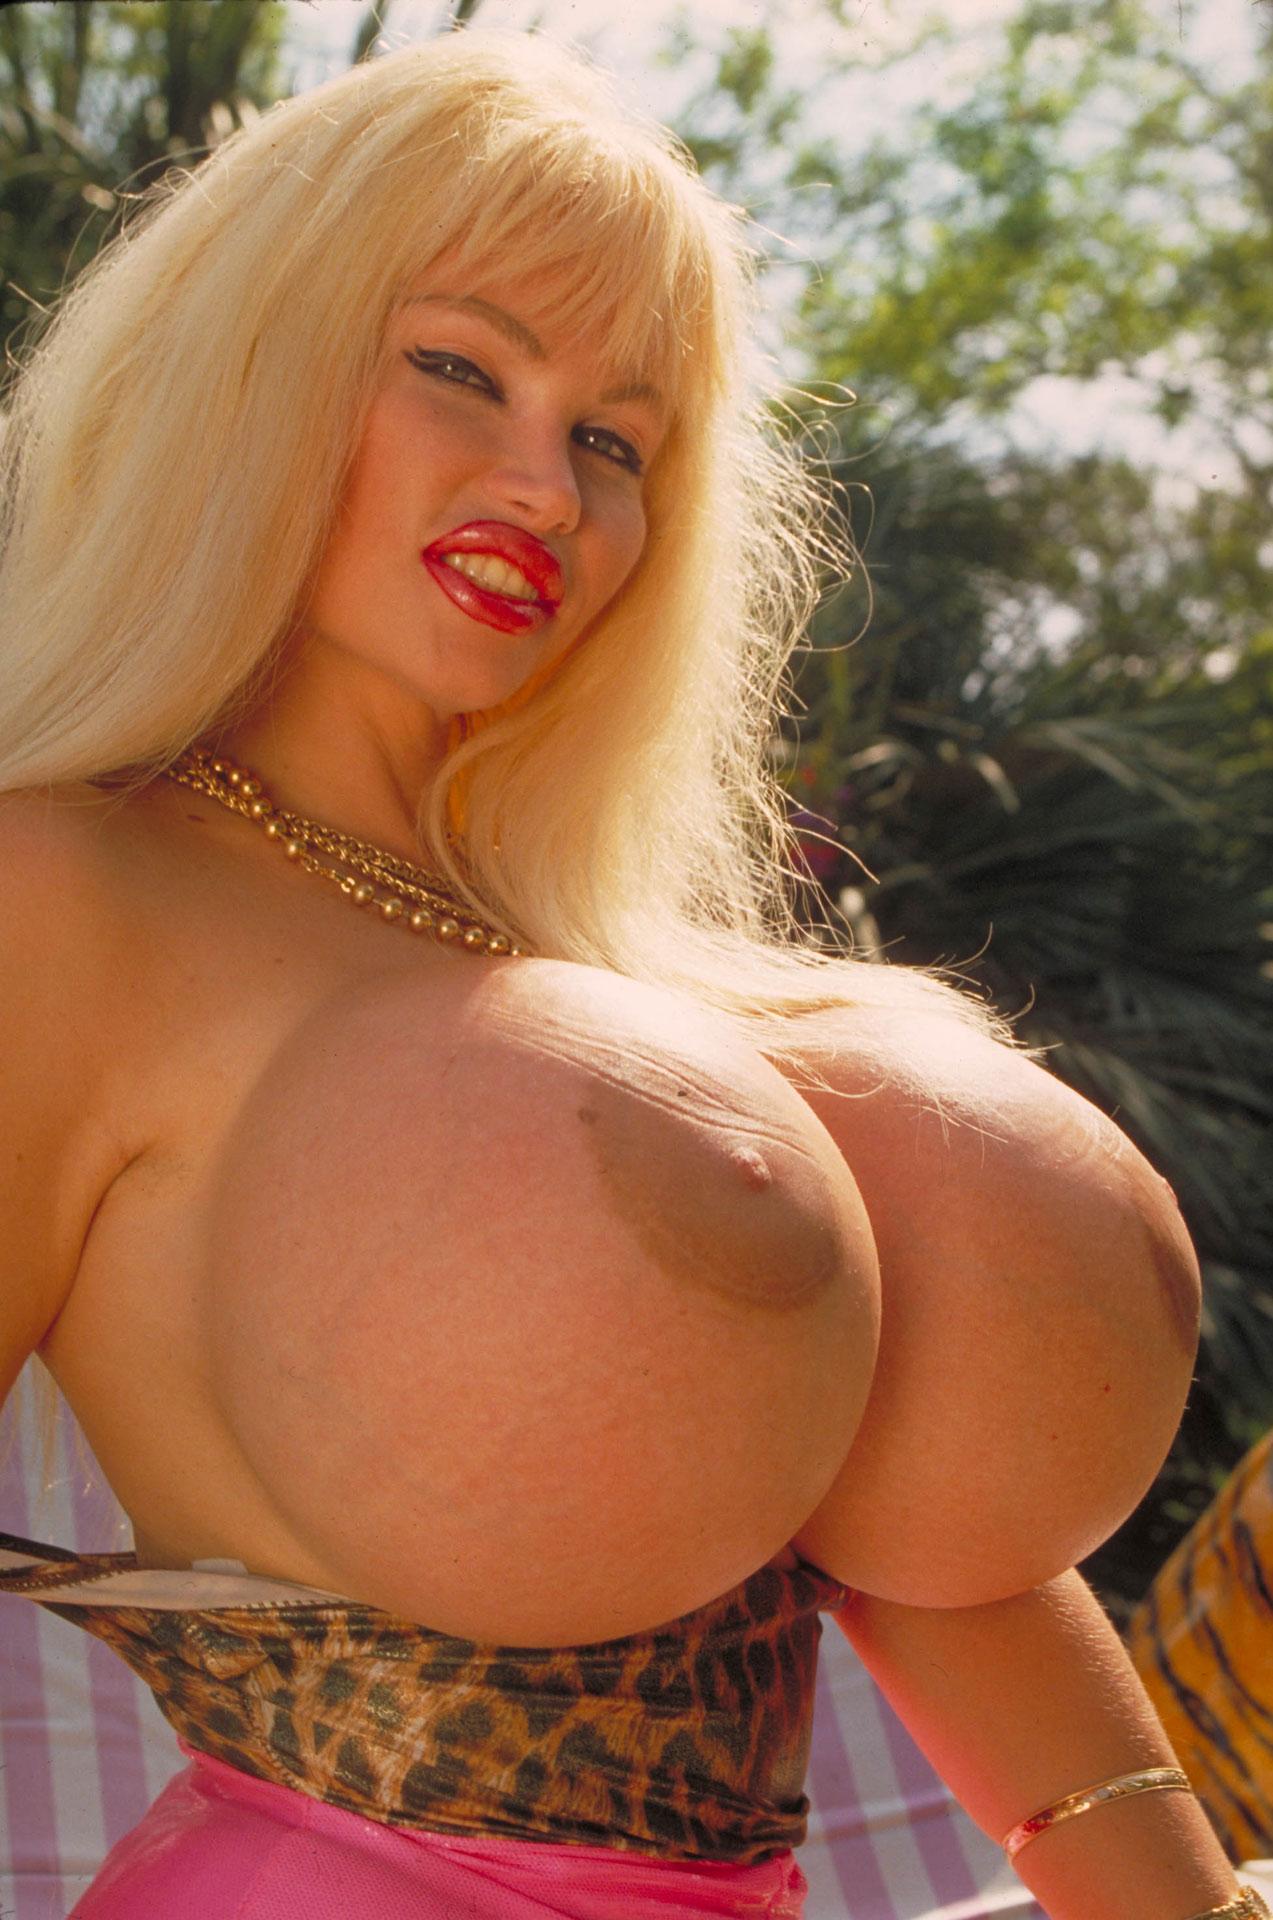 какой размер груди лола феррари - 1